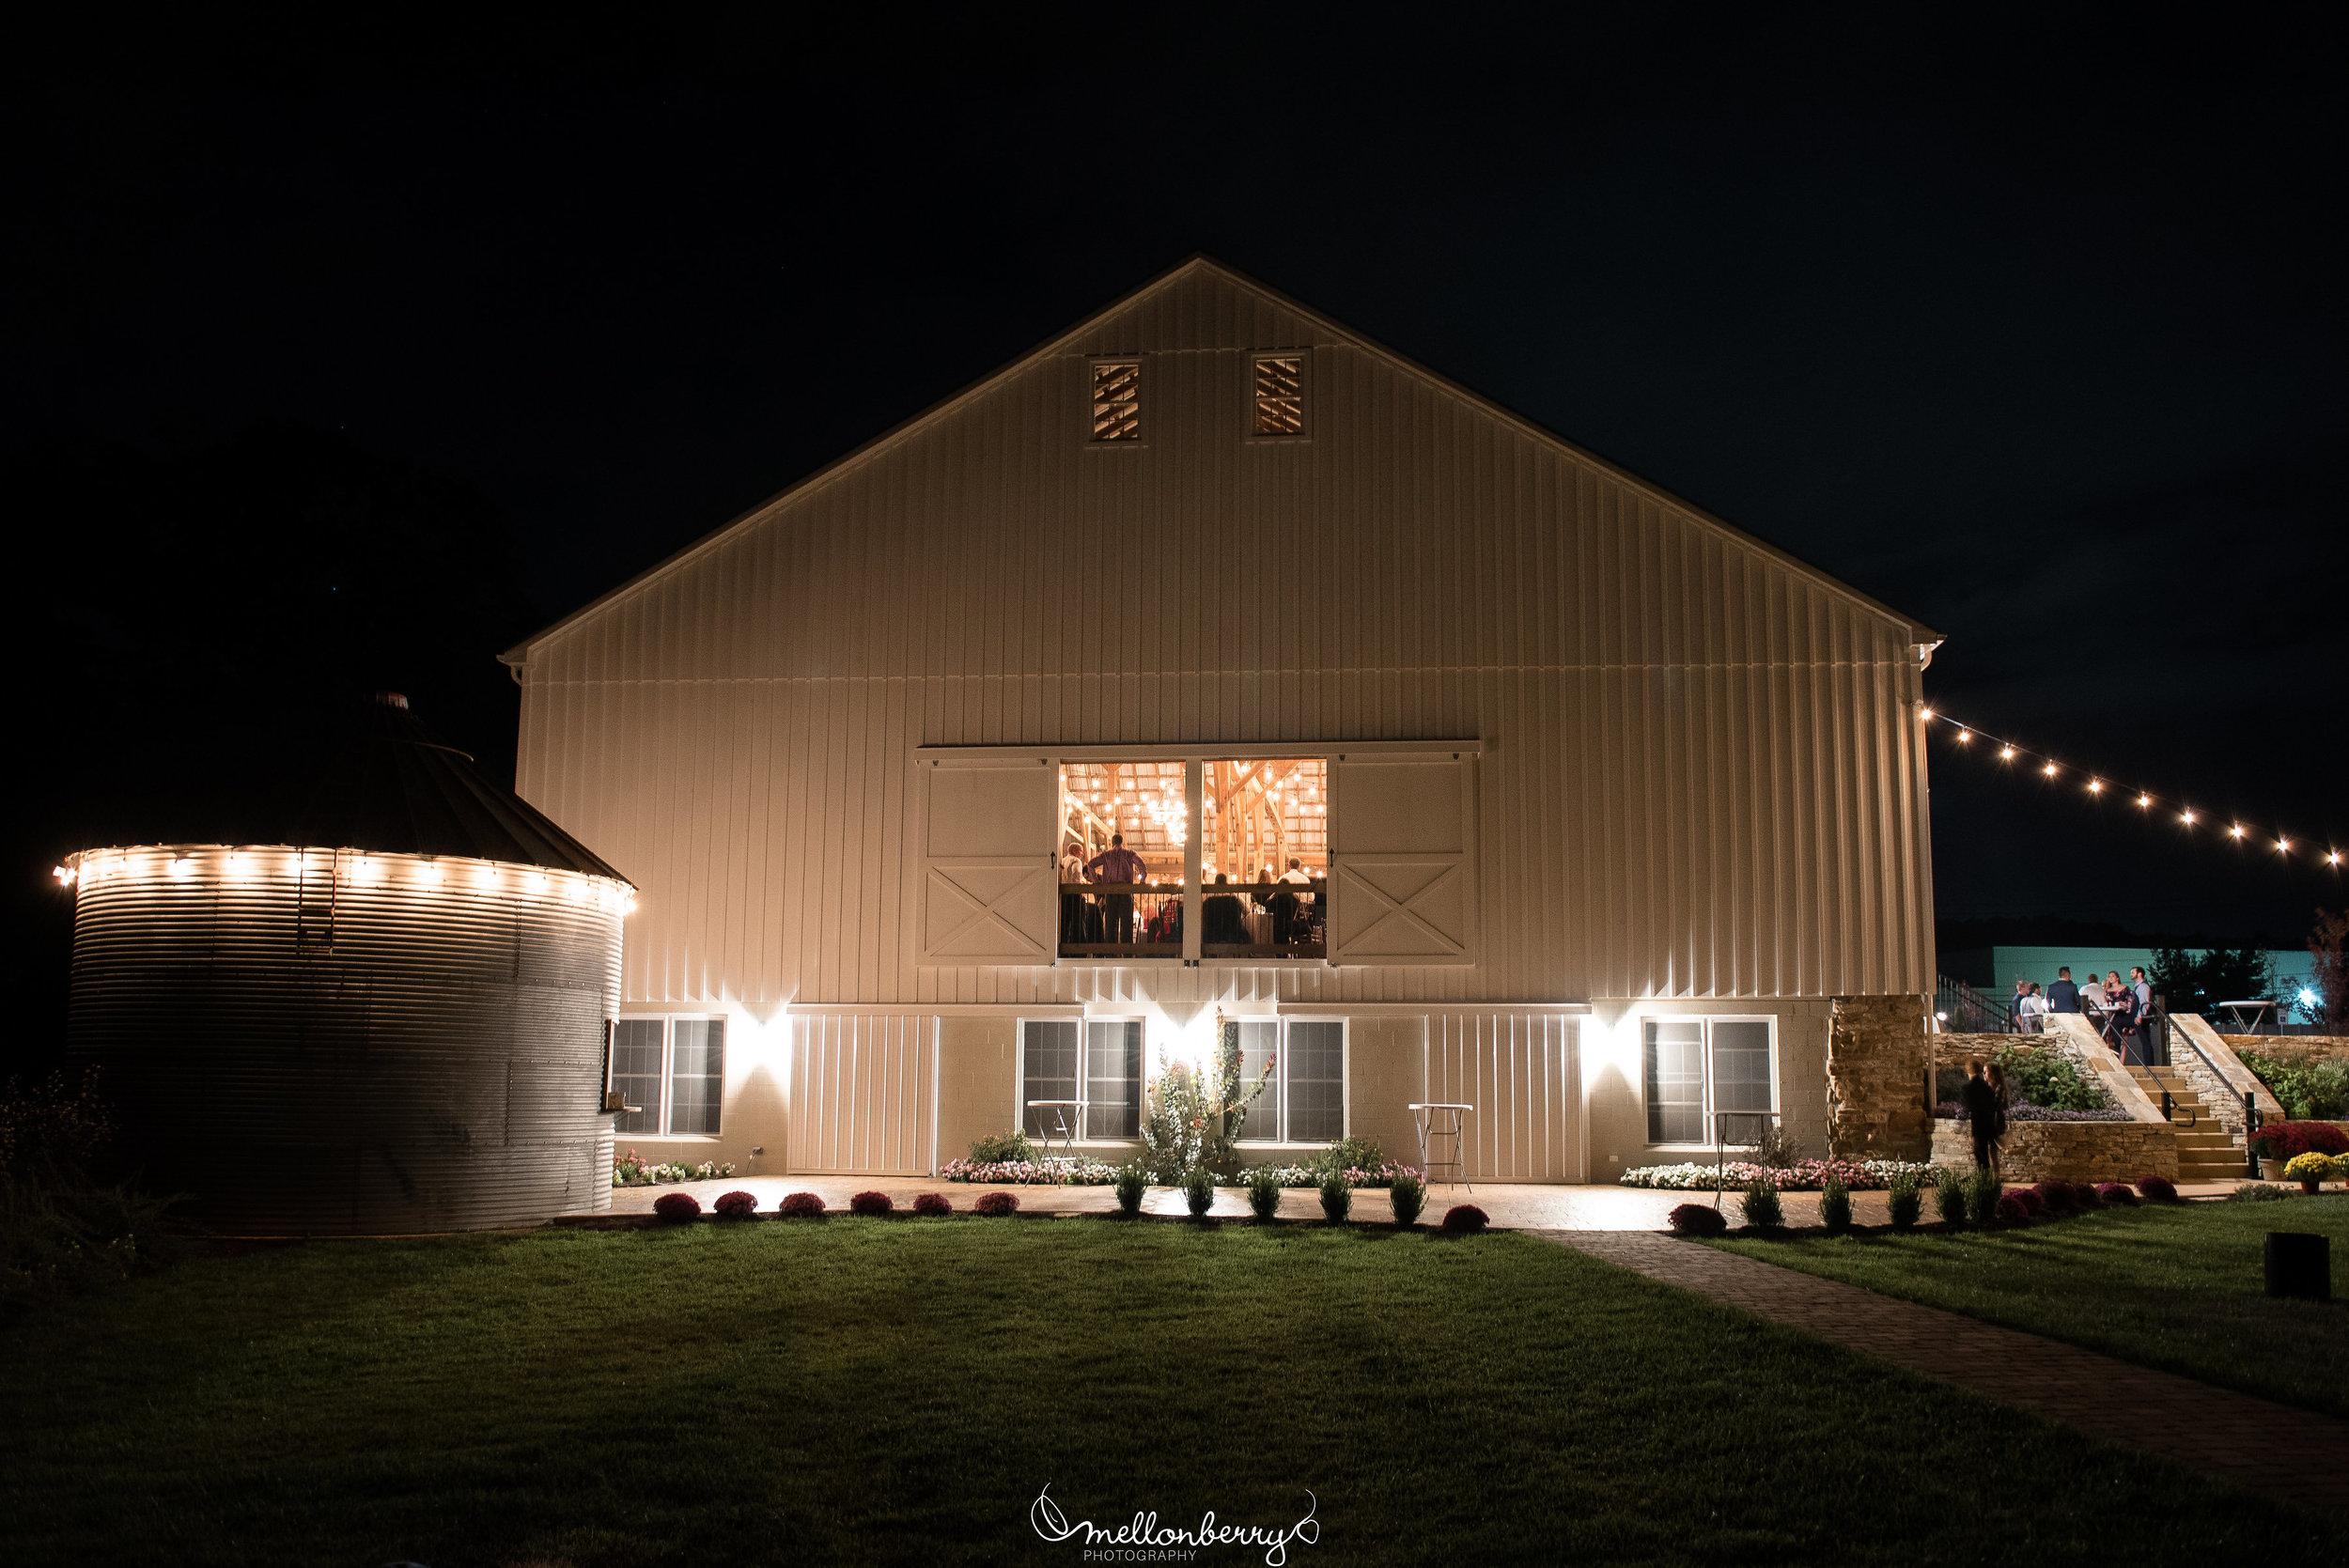 kevin and ashleig back of barn at night.jpg